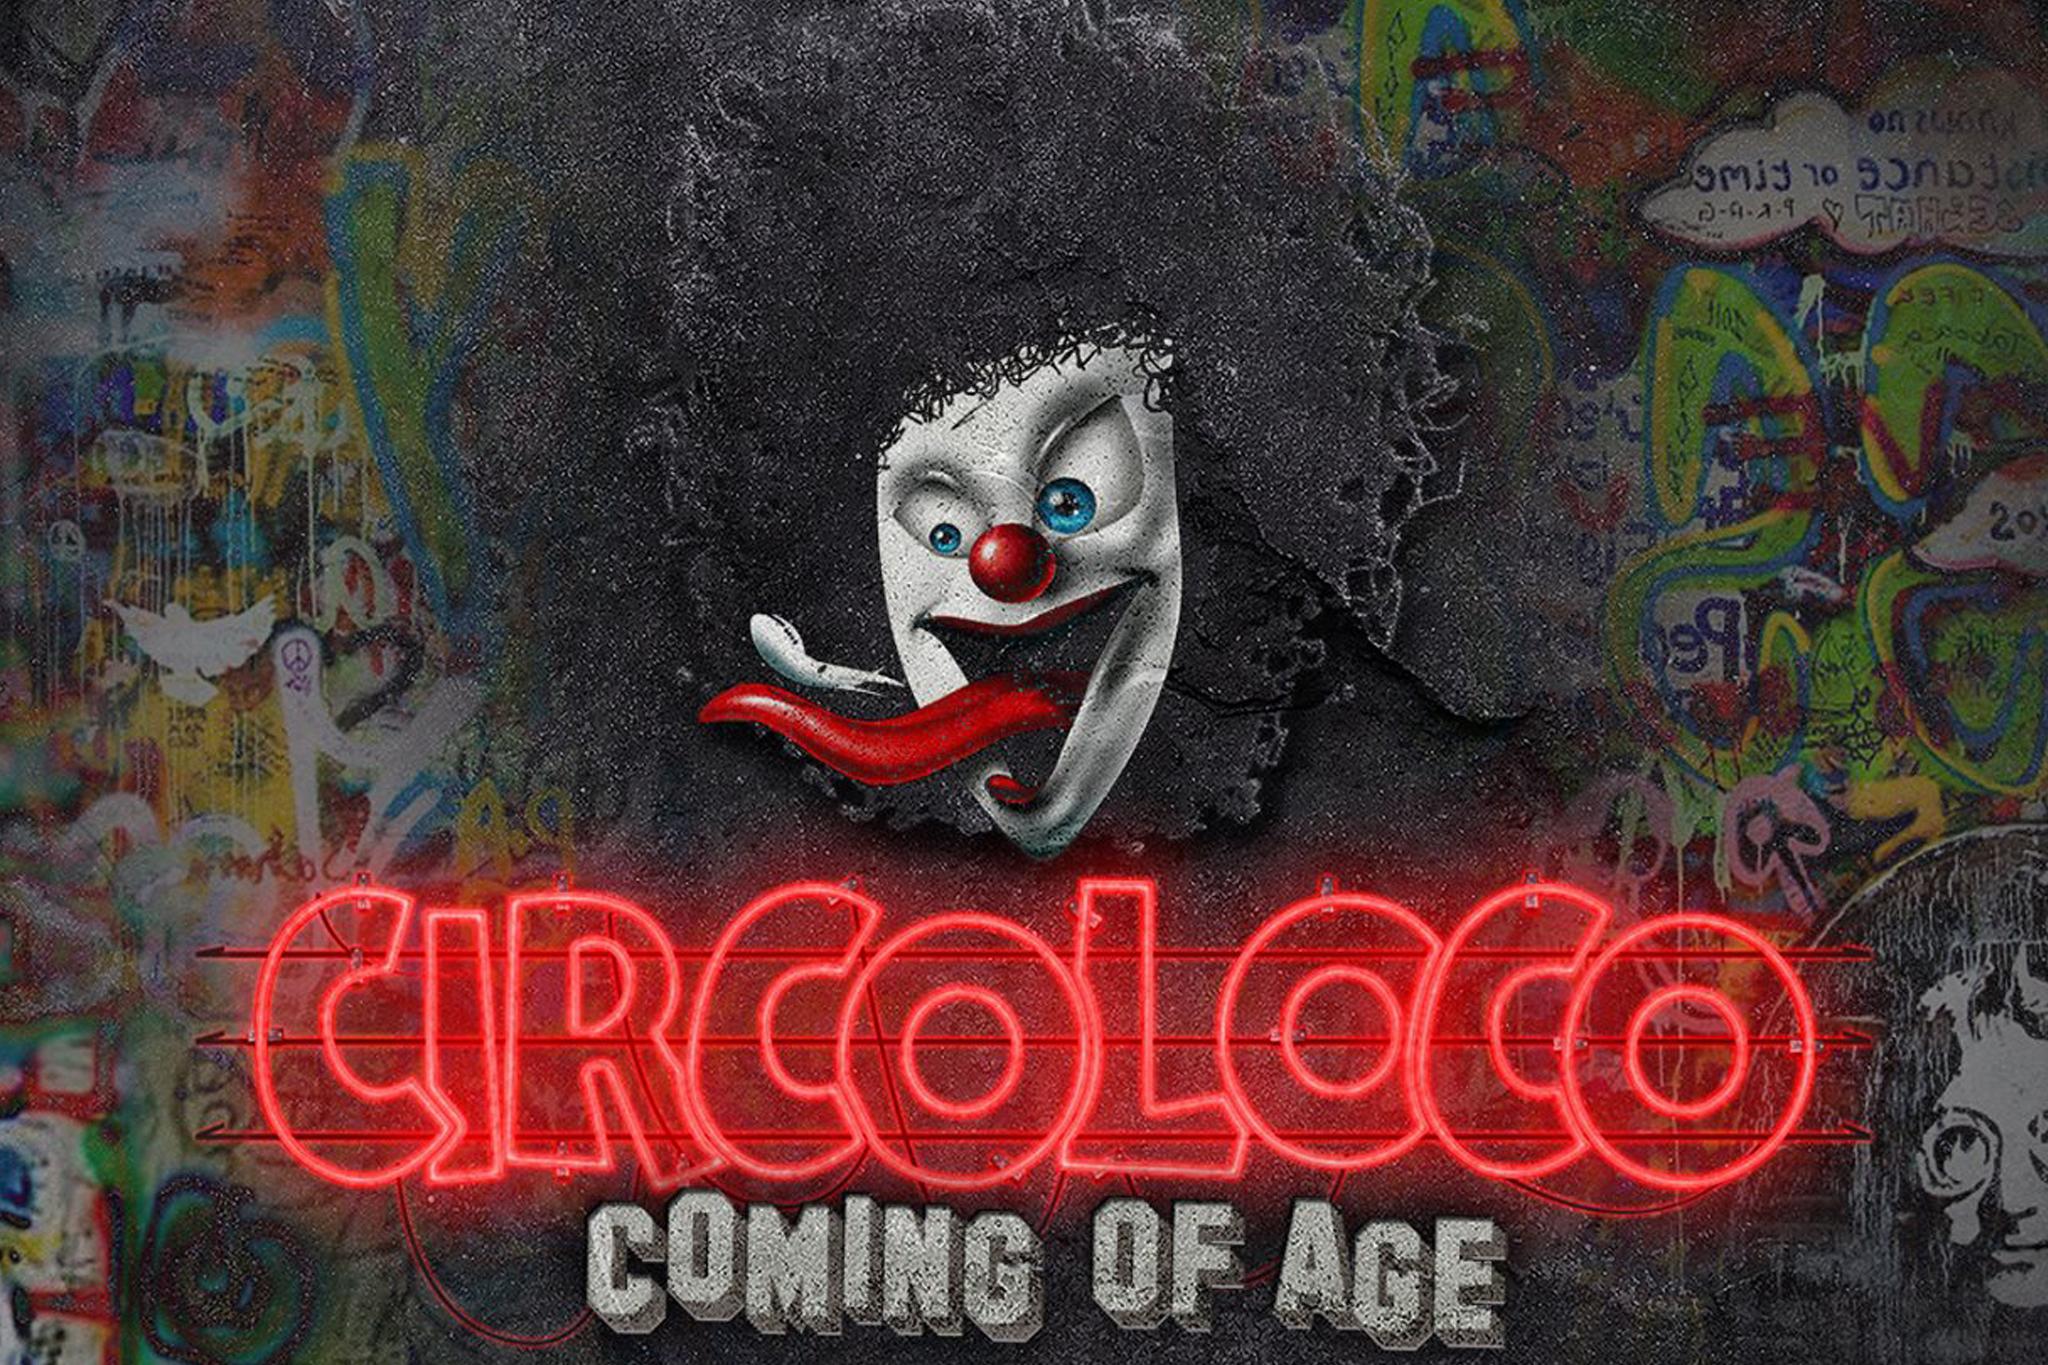 Circo Loco Announces Summer Opening Lineup